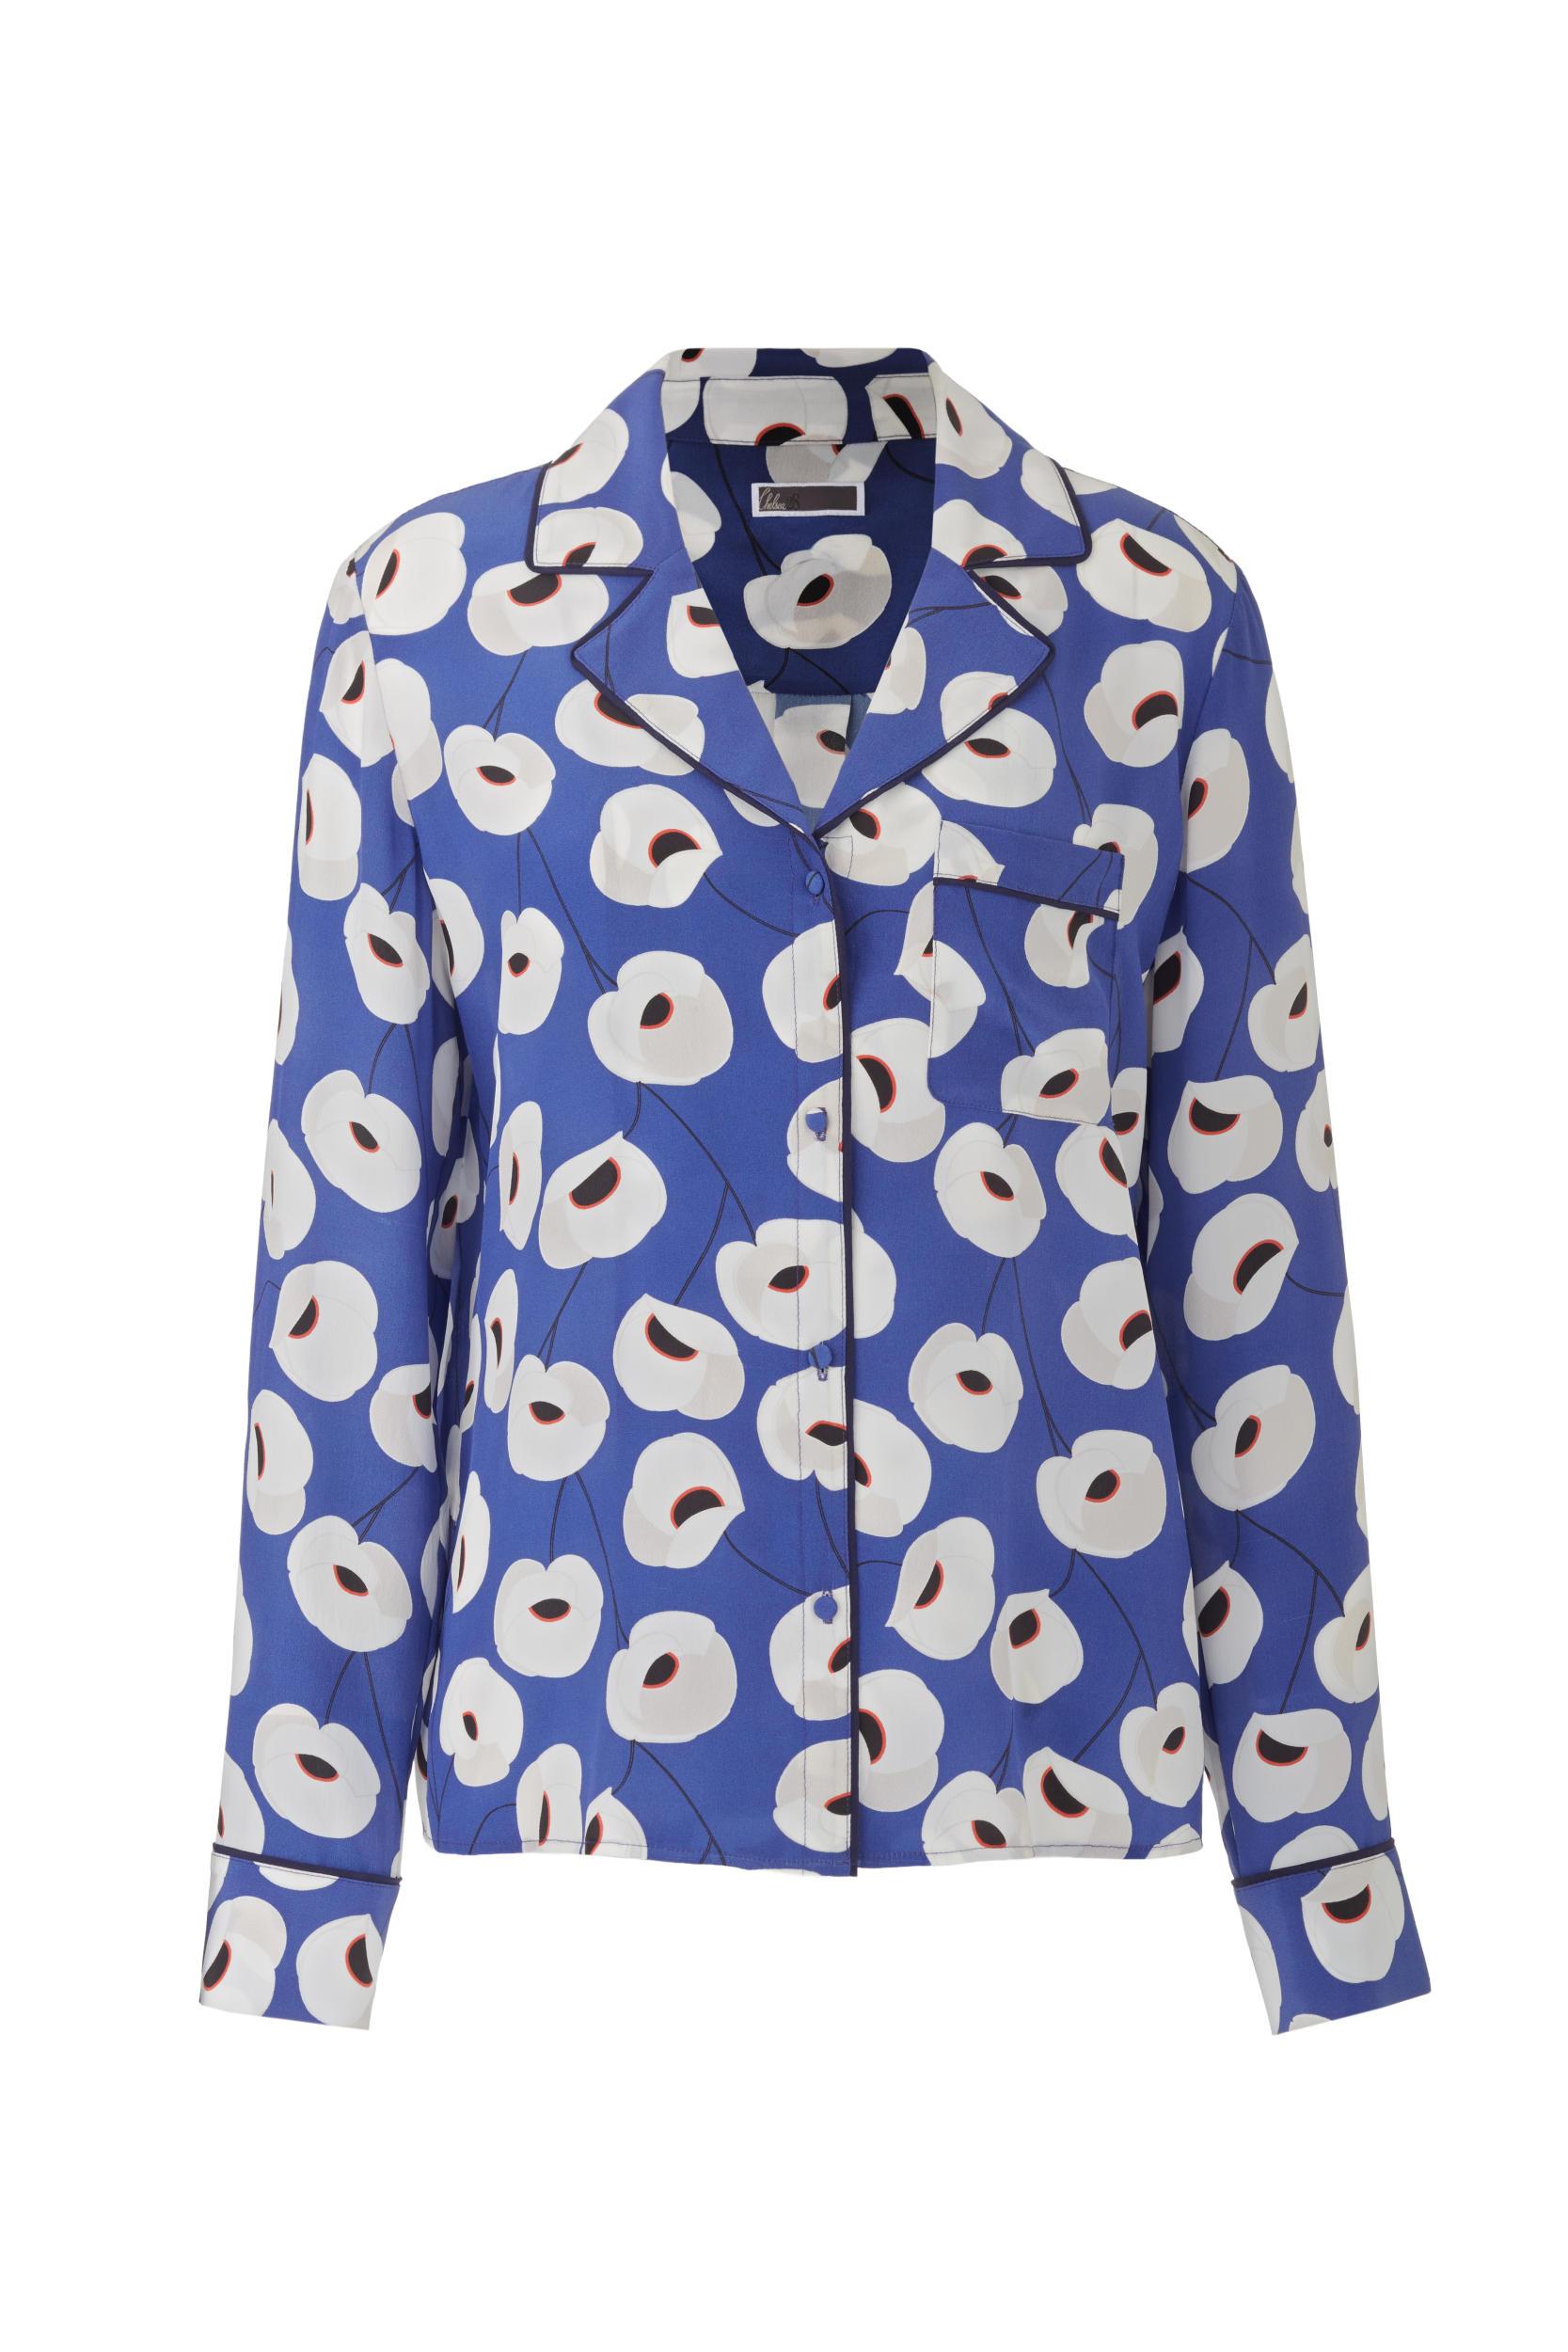 1562077947_pyjama-top-olivia-nordstrom-jpg